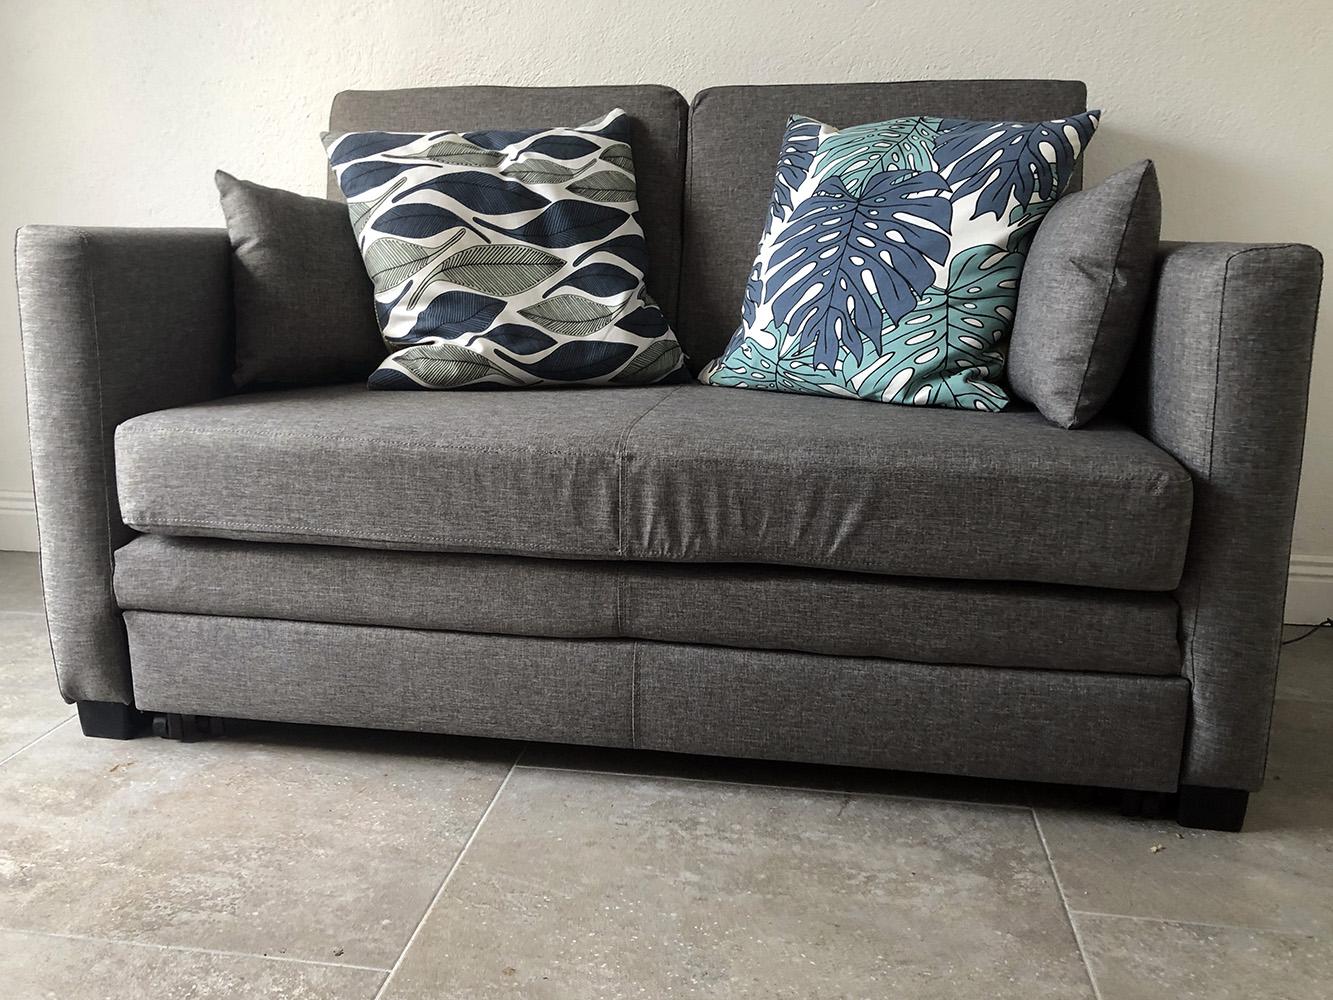 Grey Boom sofa from Patrick